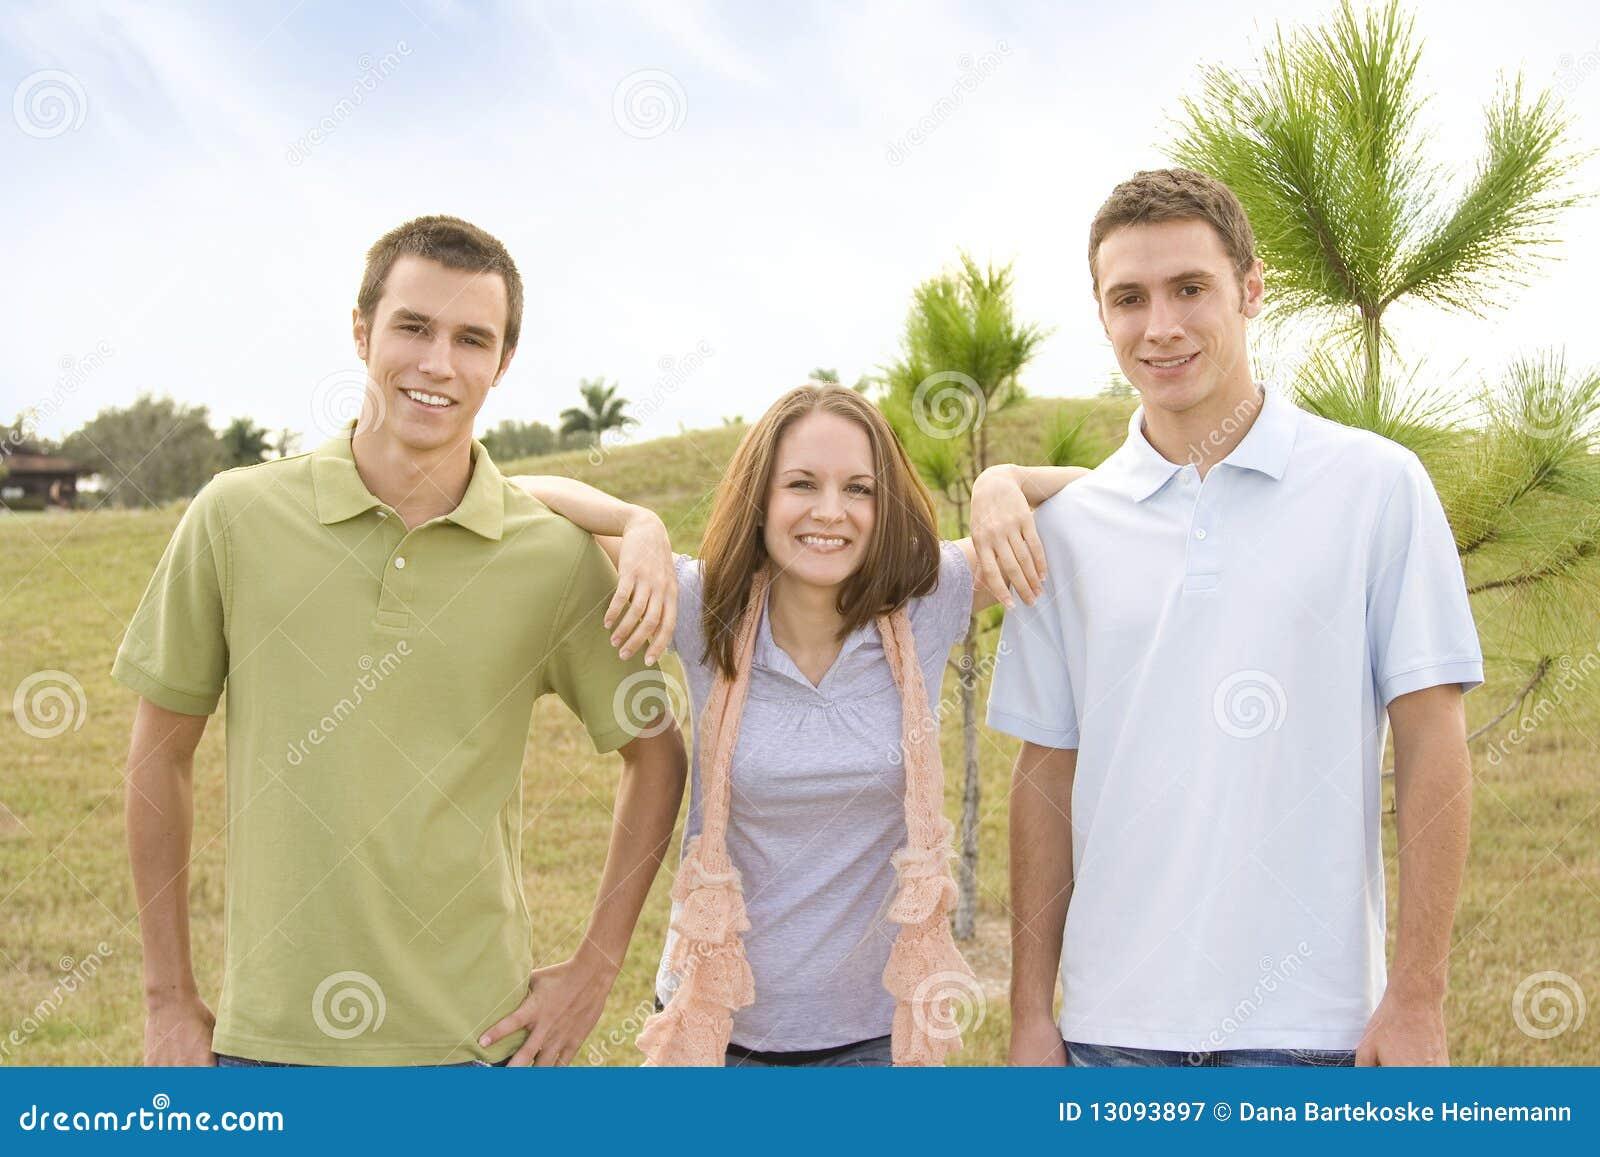 Casual friends and men | Erotic foto)